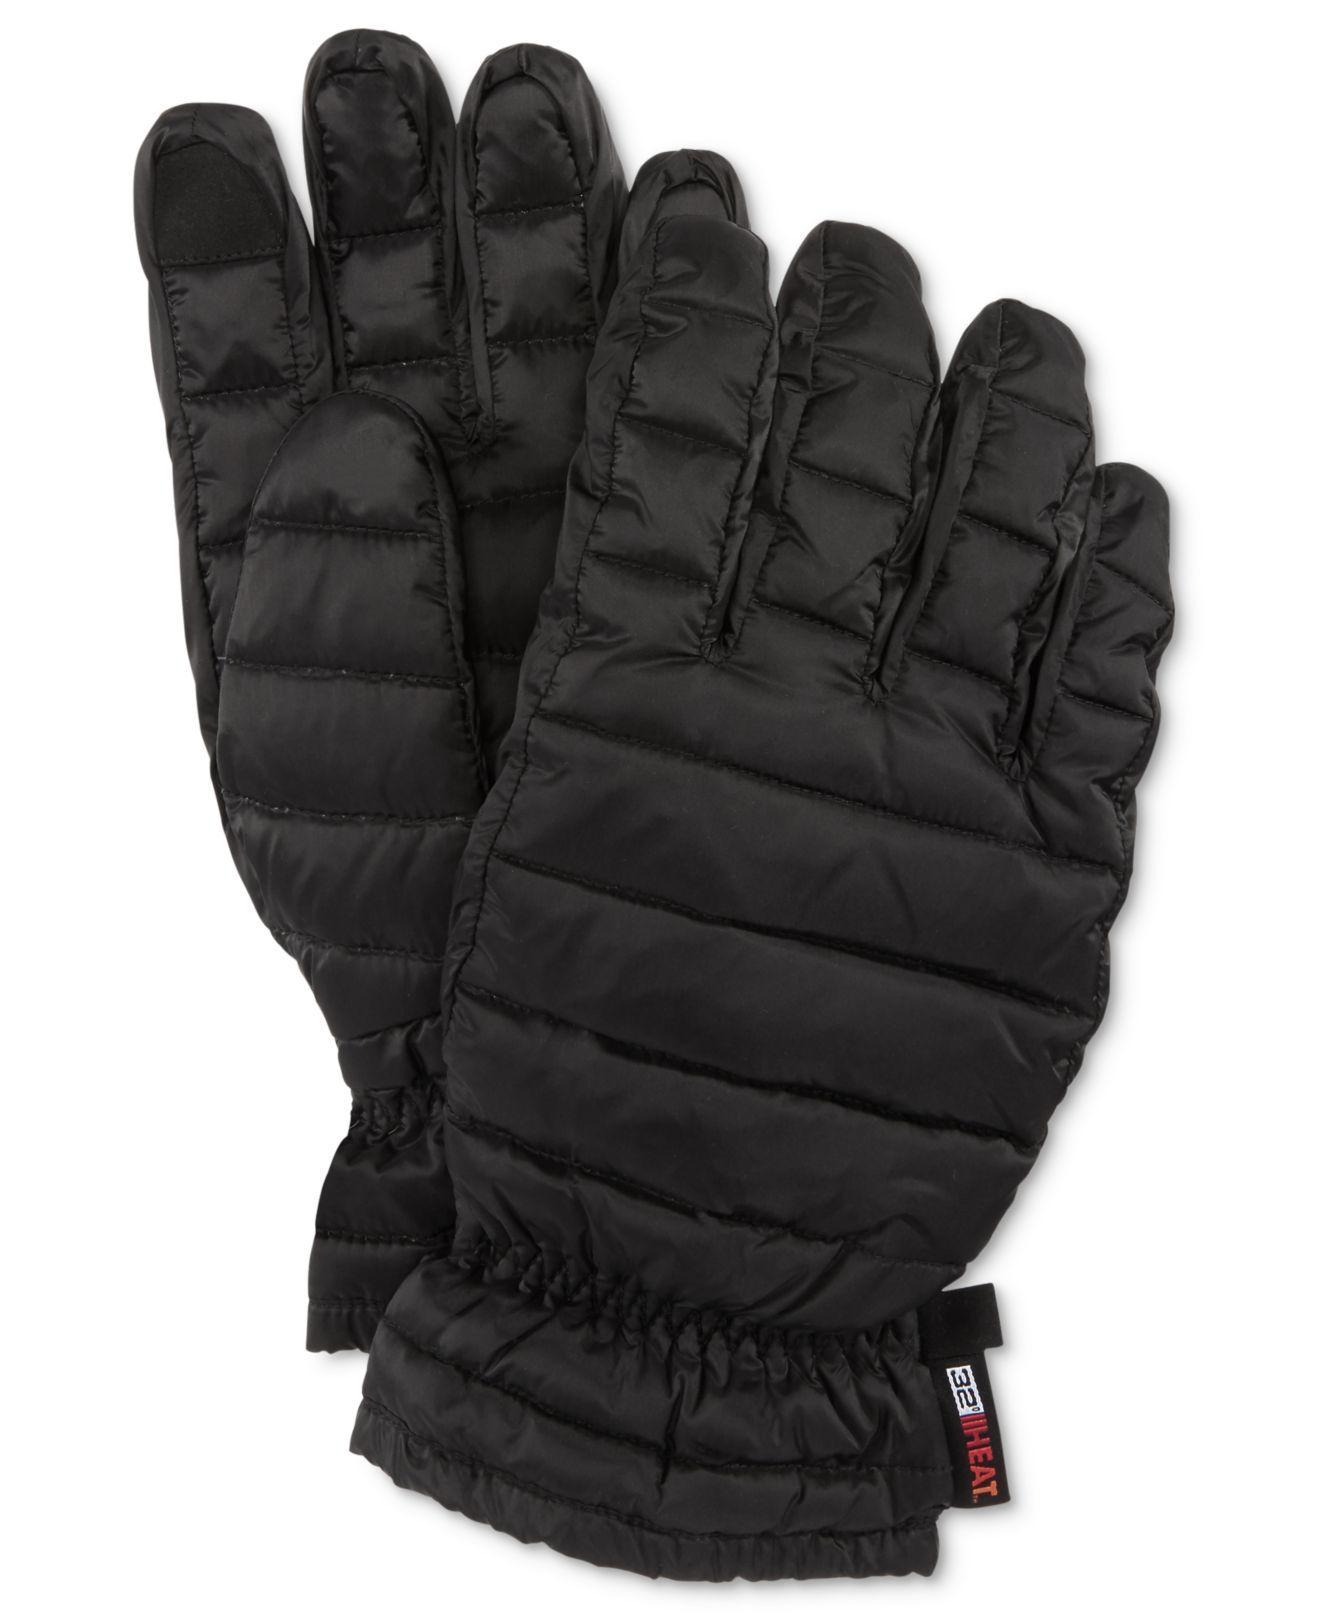 Mens down gloves - Featured 32 Degrees Black Men S Down Gloves